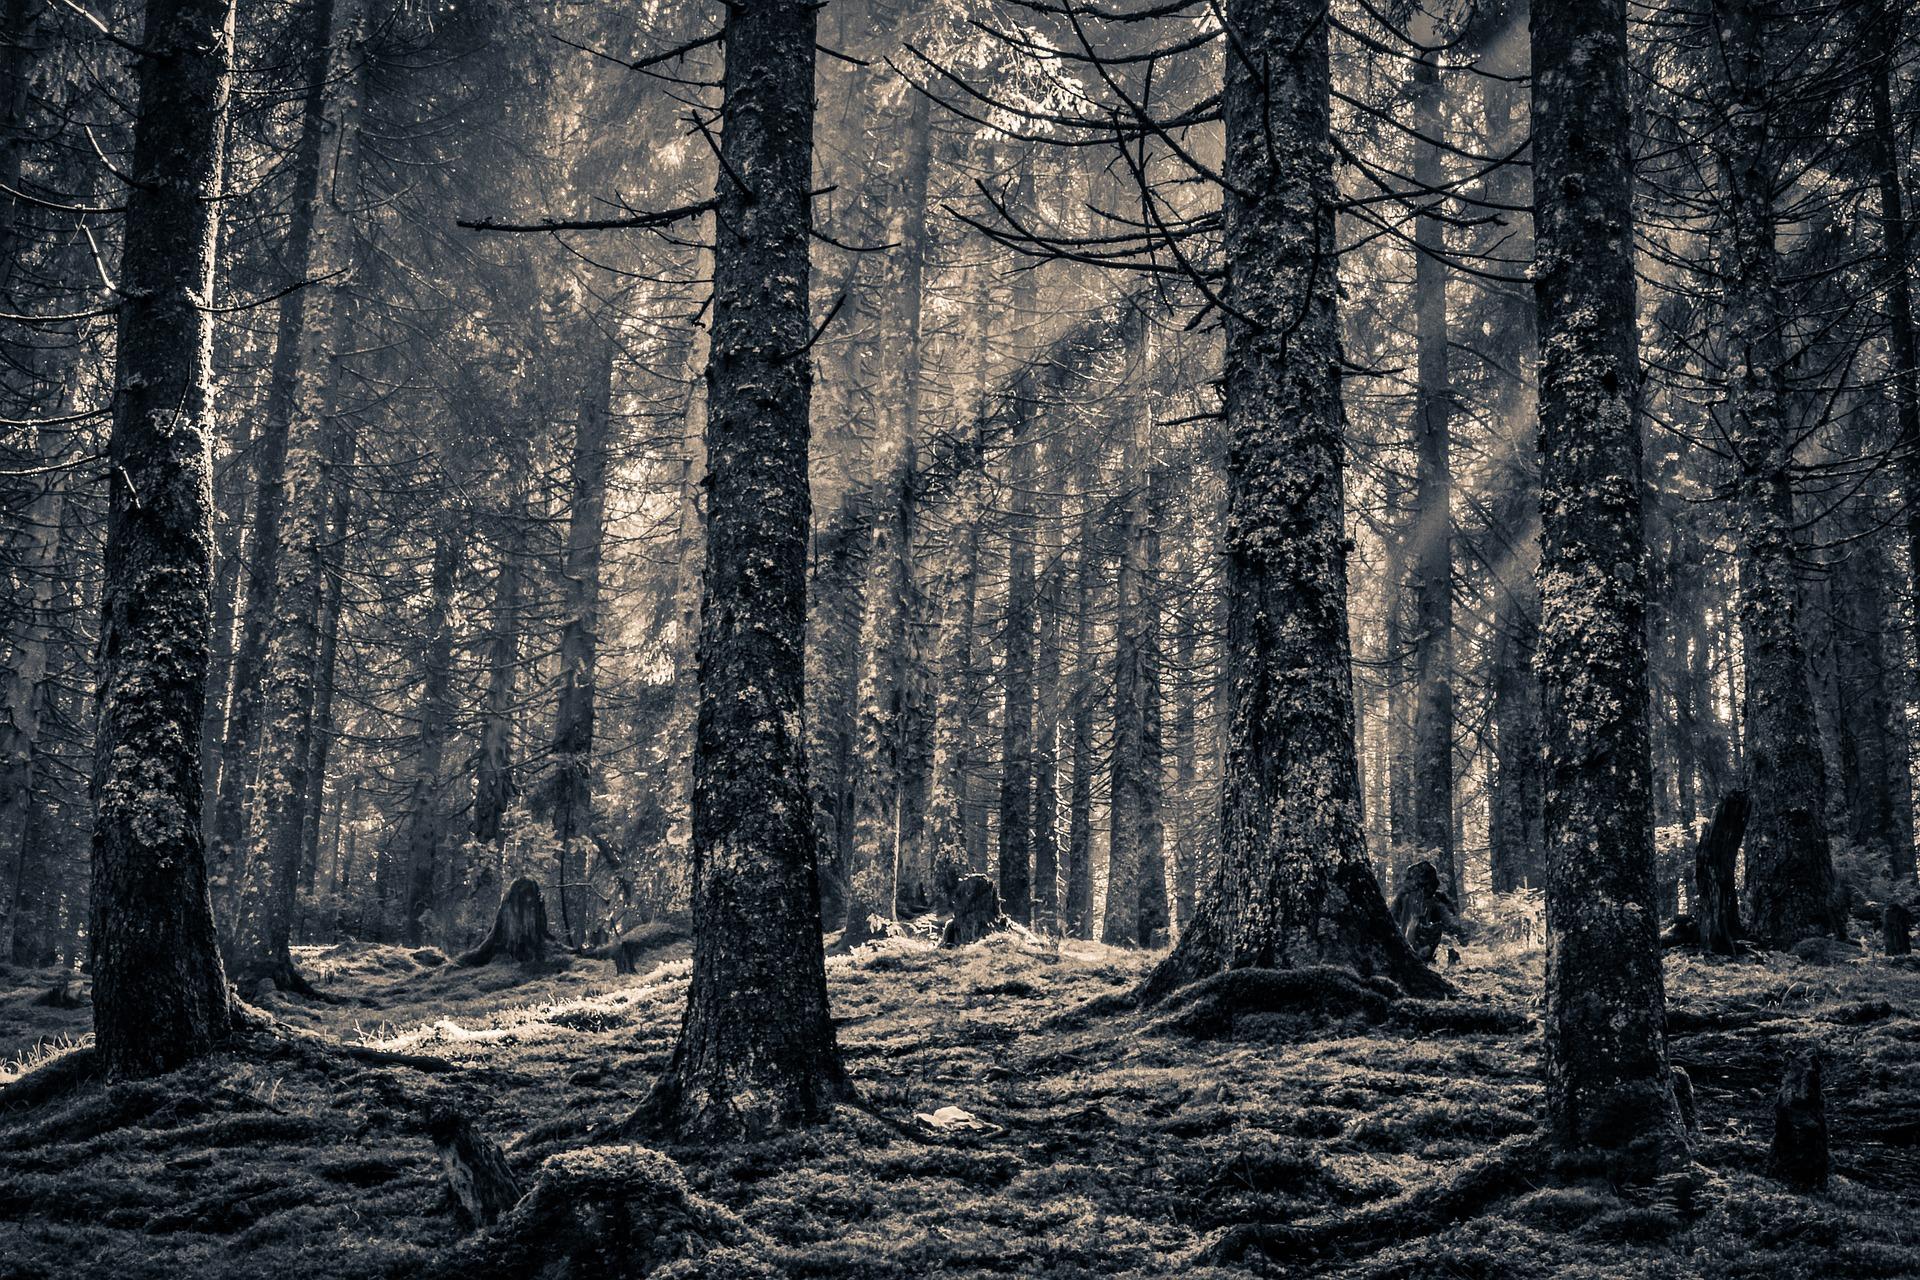 forest-998464_1920.jpg